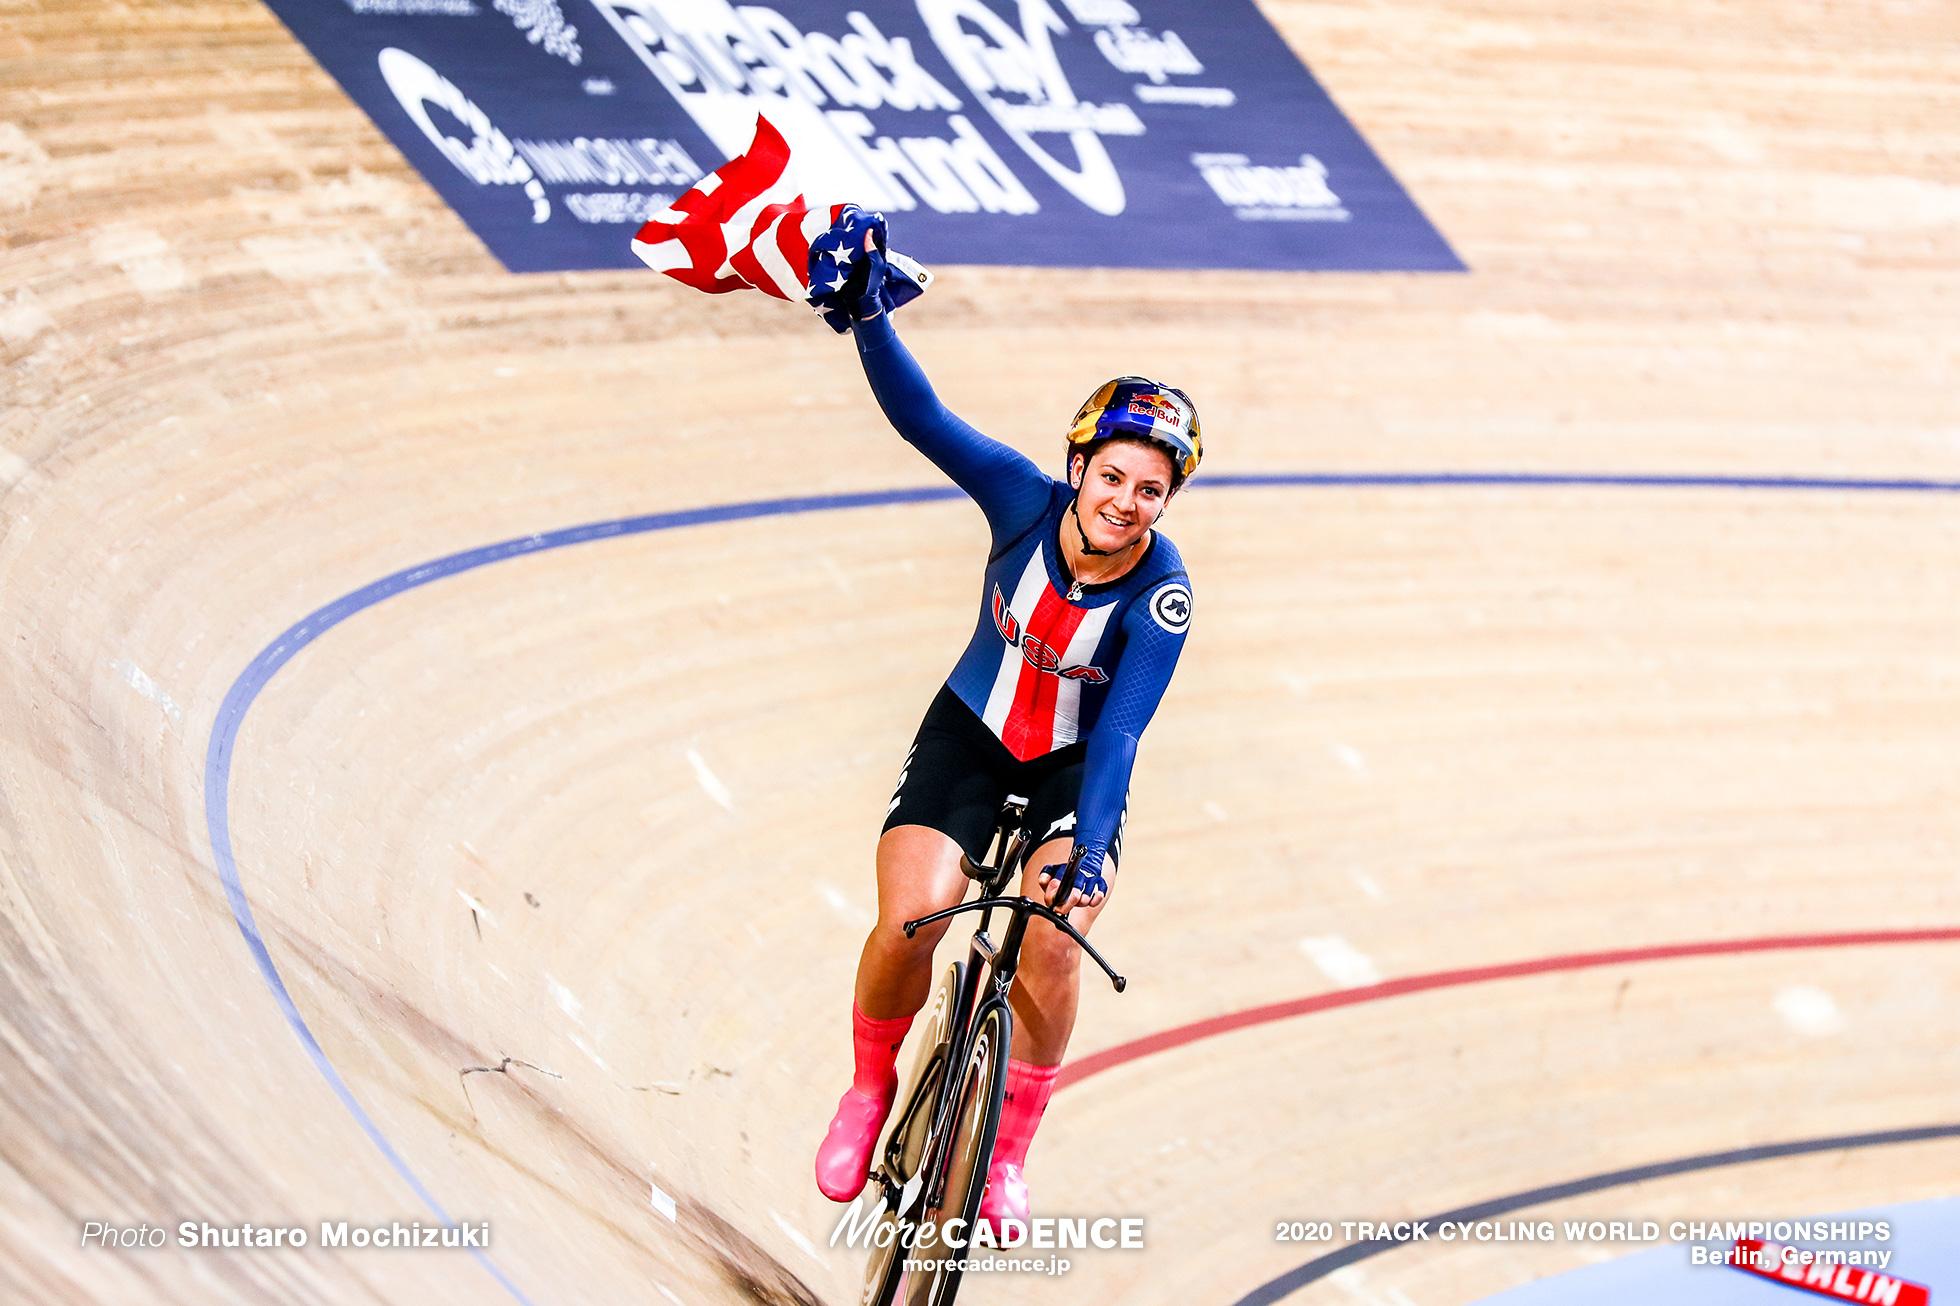 Final / Women's Team Pursuit / 2020 Track Cycling World Championships , Jennifer Valente ジェニファー・バレンテ